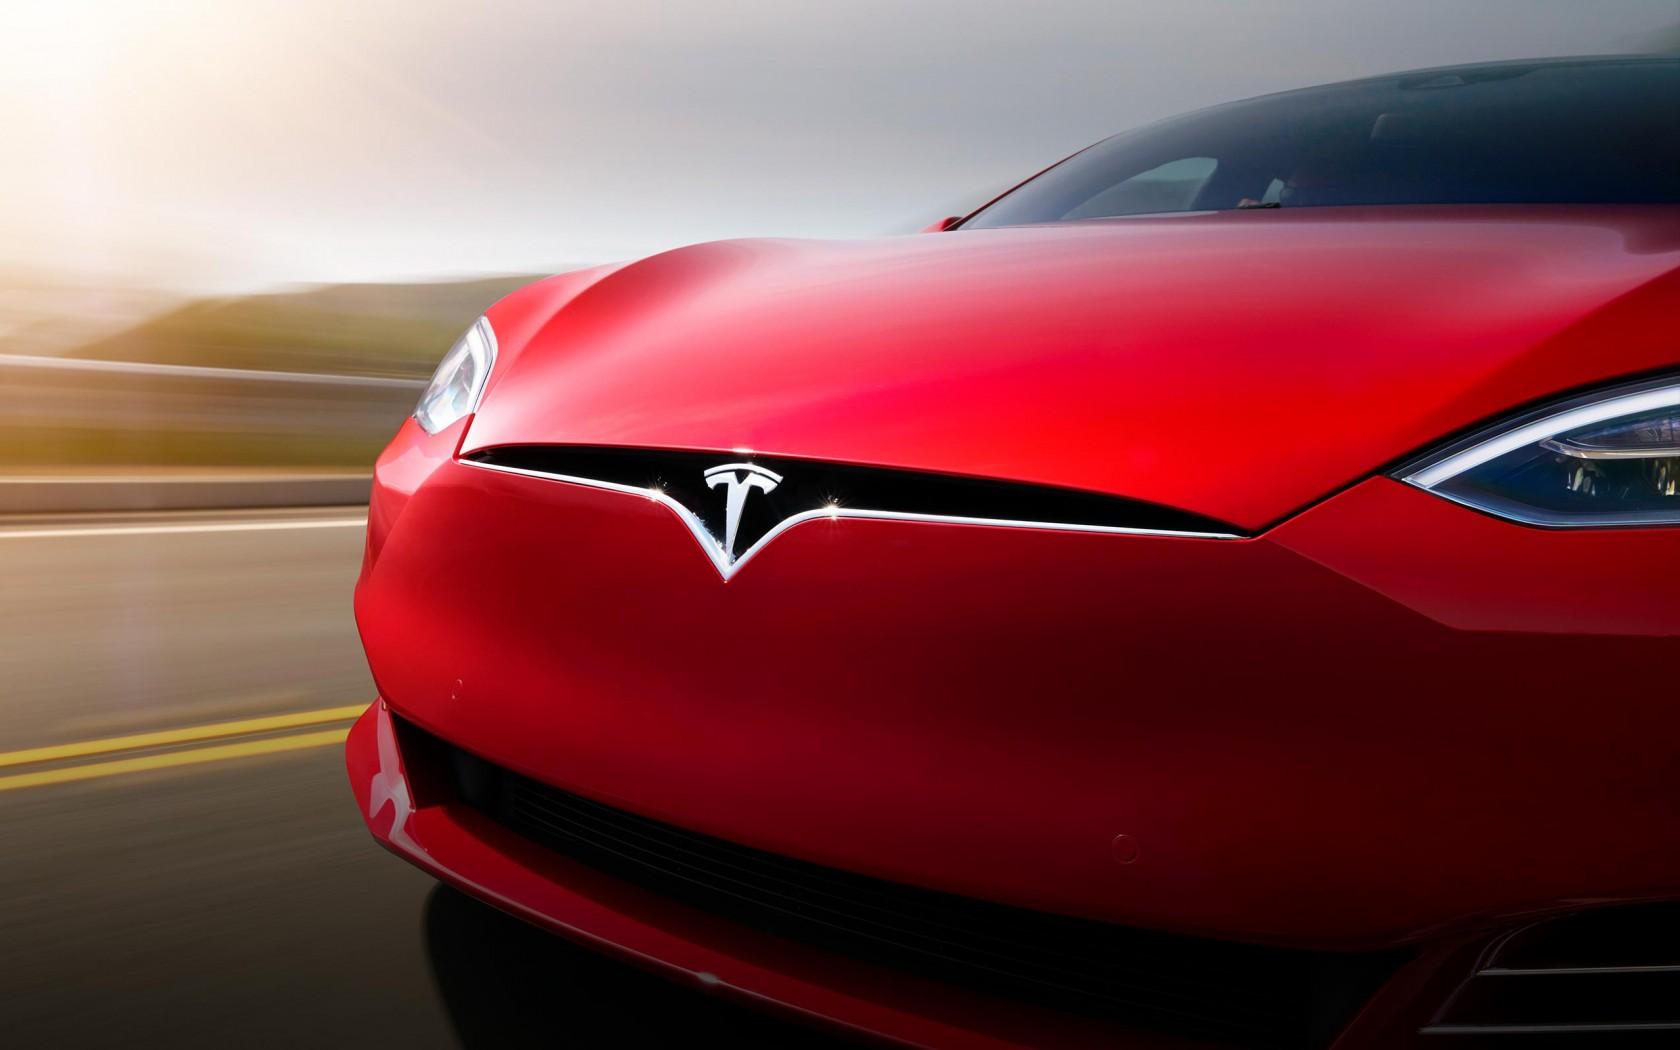 Wallpaper Desktop 3d Hd Car 2017 Tesla Model S Wallpapers Hd Wallpapers Id 19784